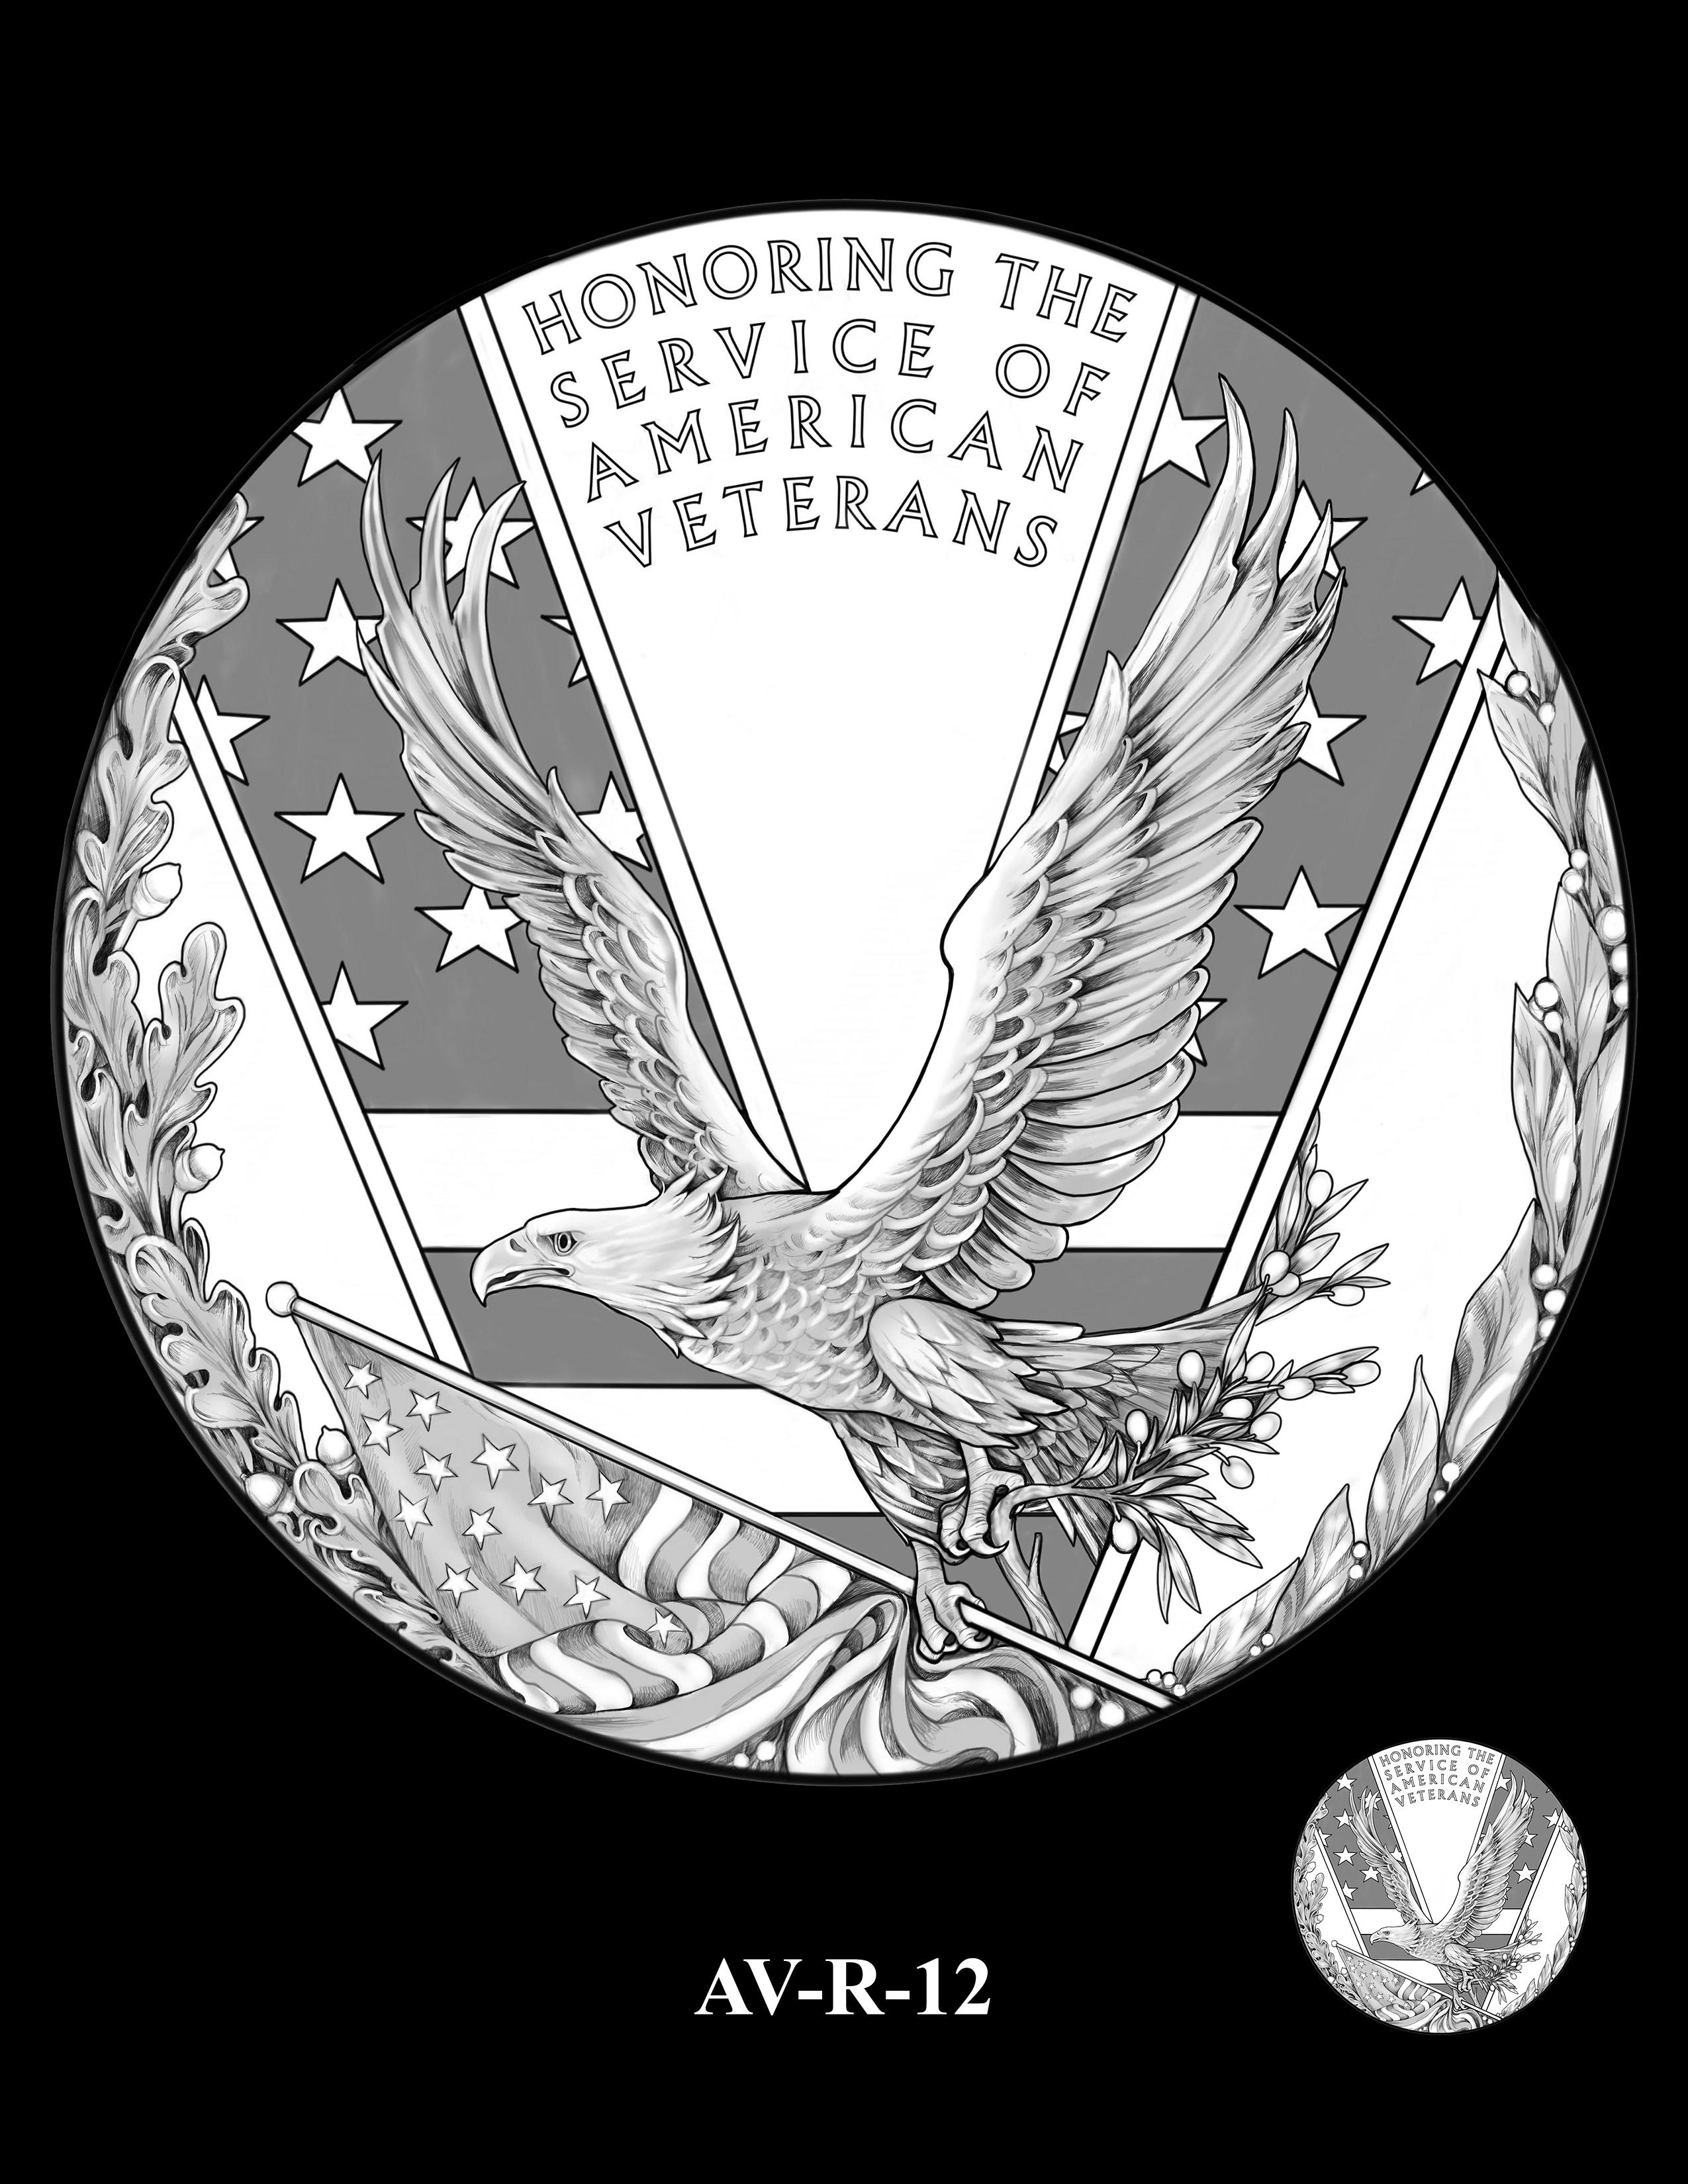 AV-R-12 - American Veterans Medal